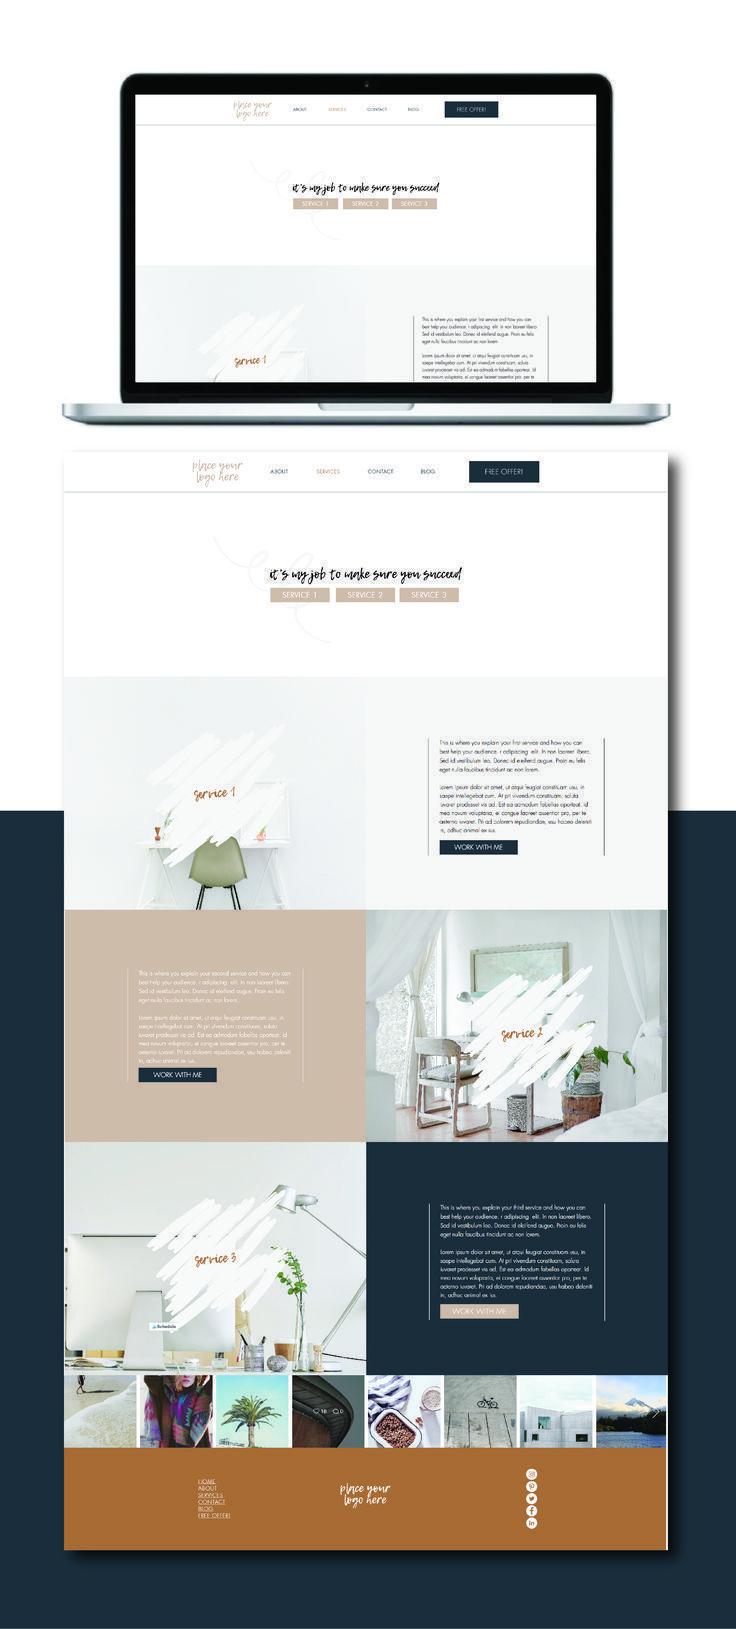 Wix Website Template | Custom Template for Small Business | Website Design for Freelancers | Desert